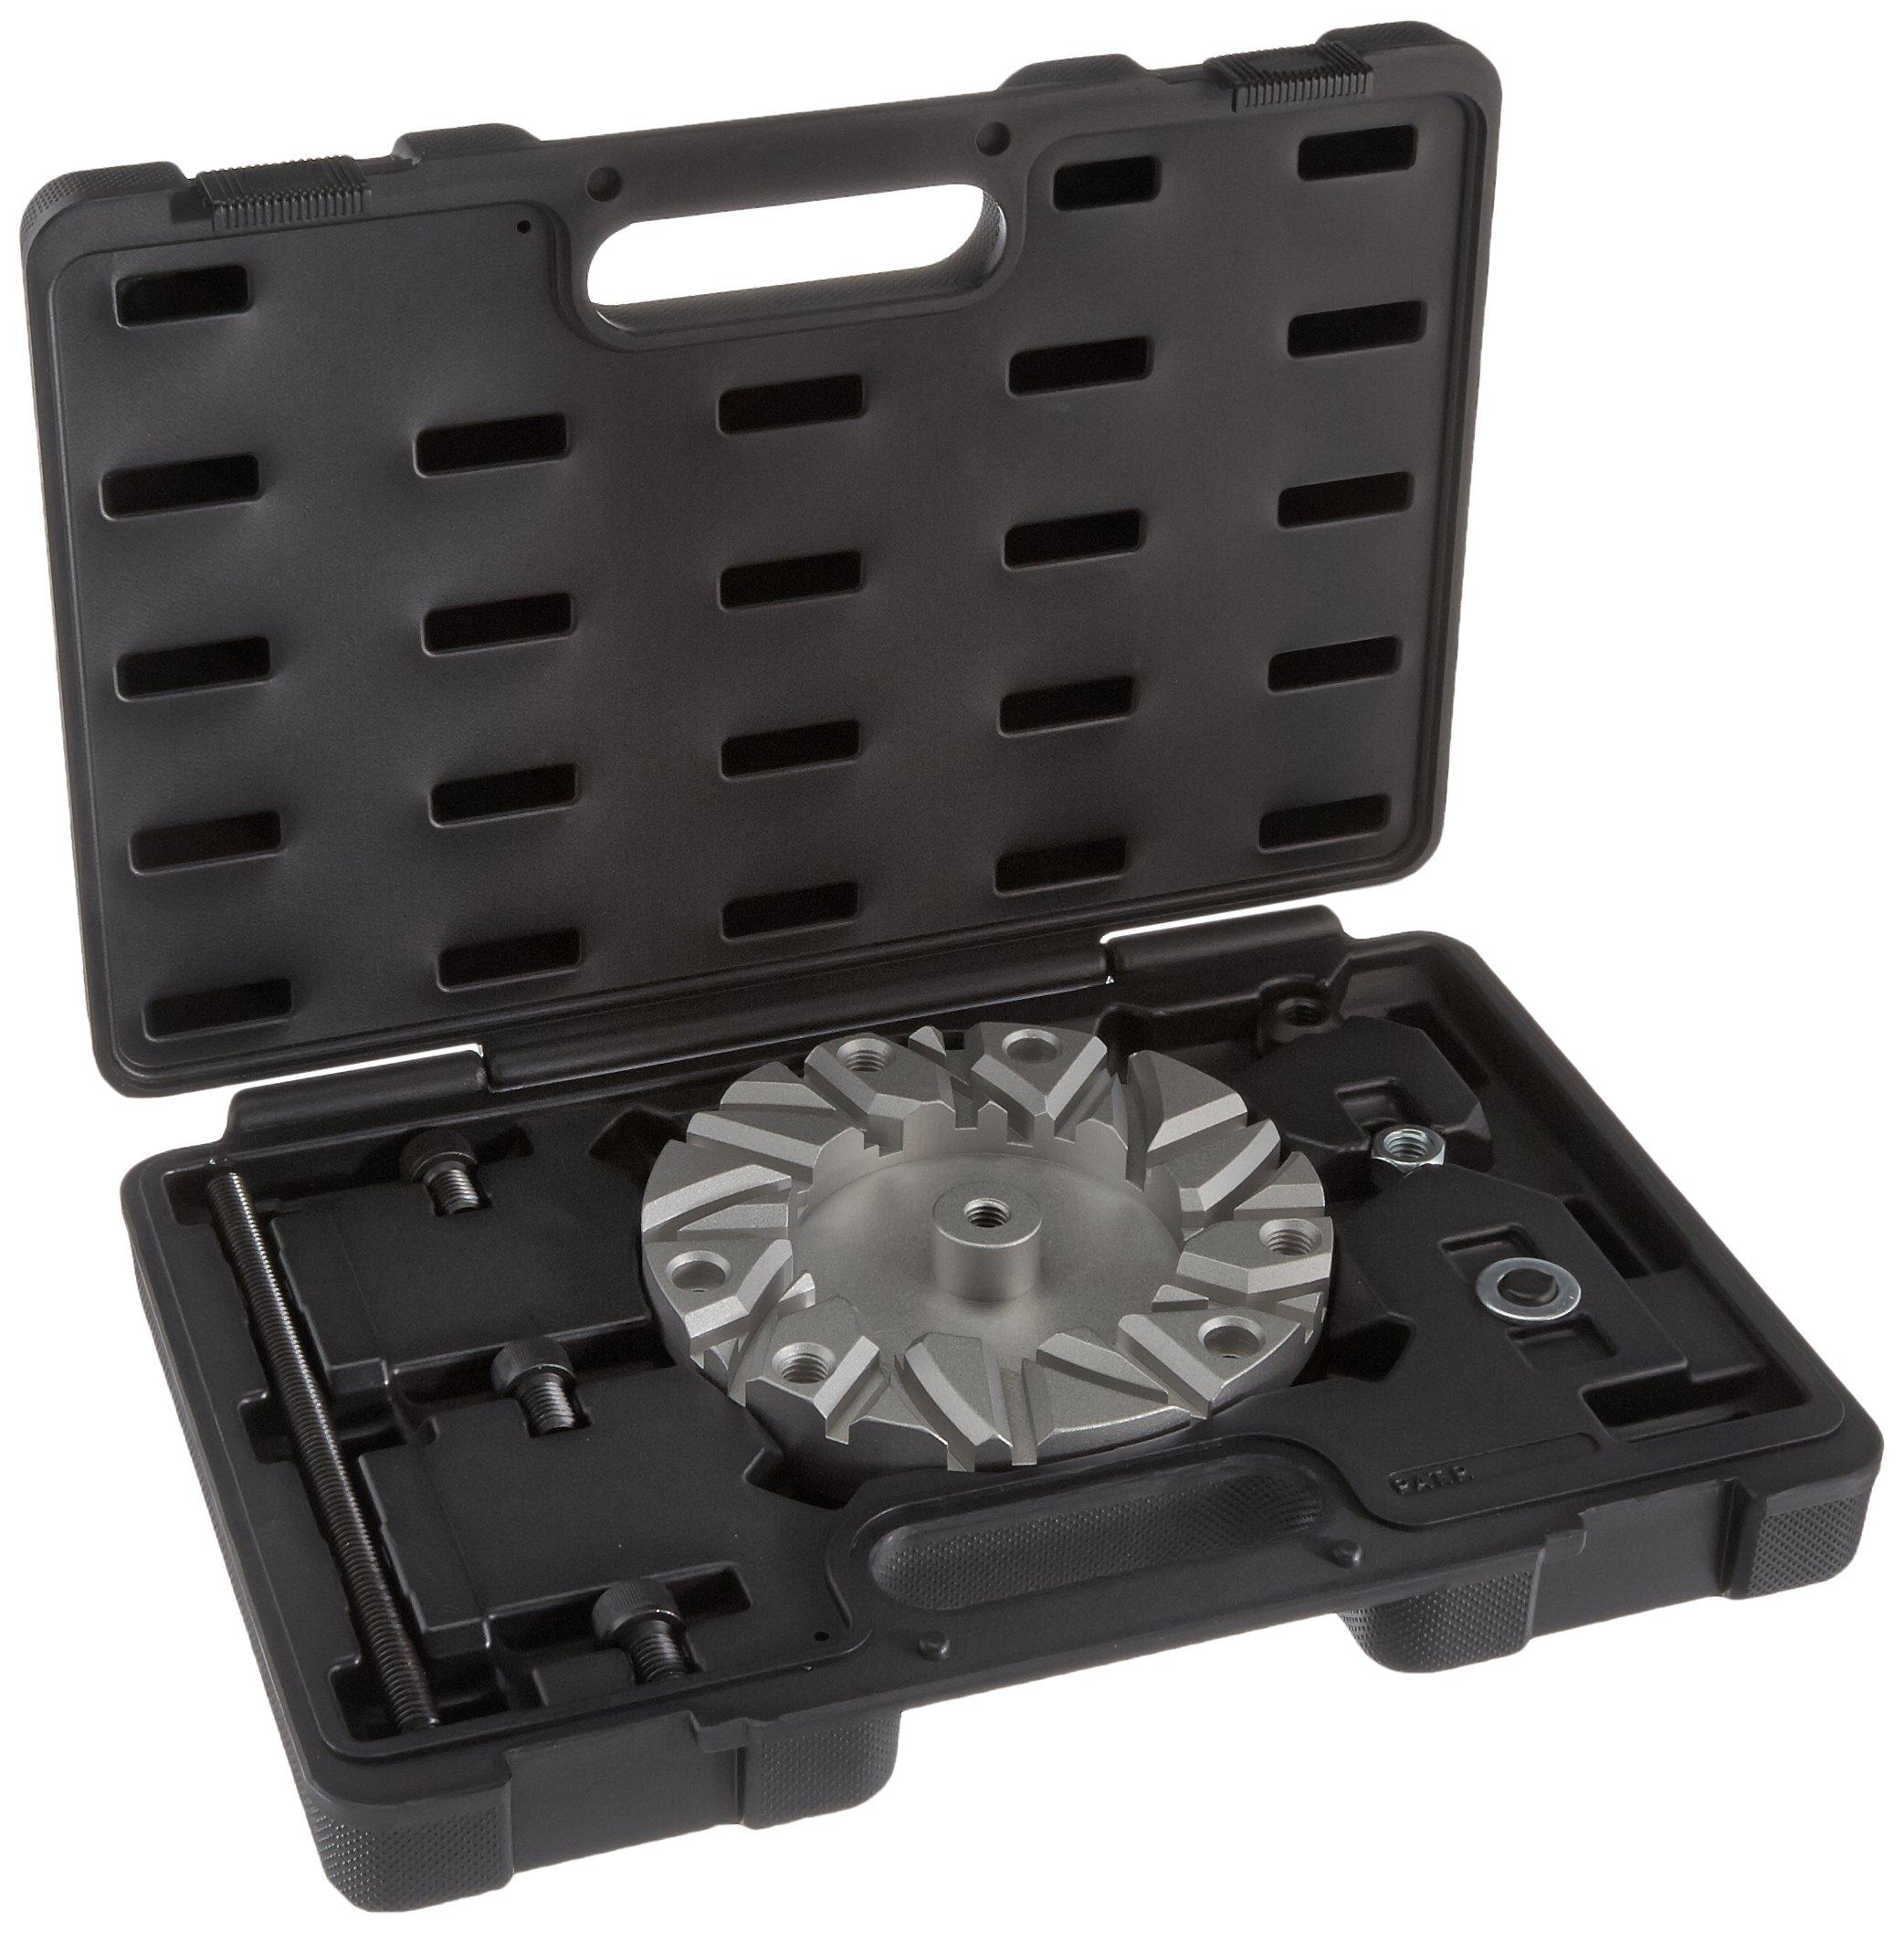 OTC Tools 4972 Drive Clutch Holding Fixture by OTC (Image #2)